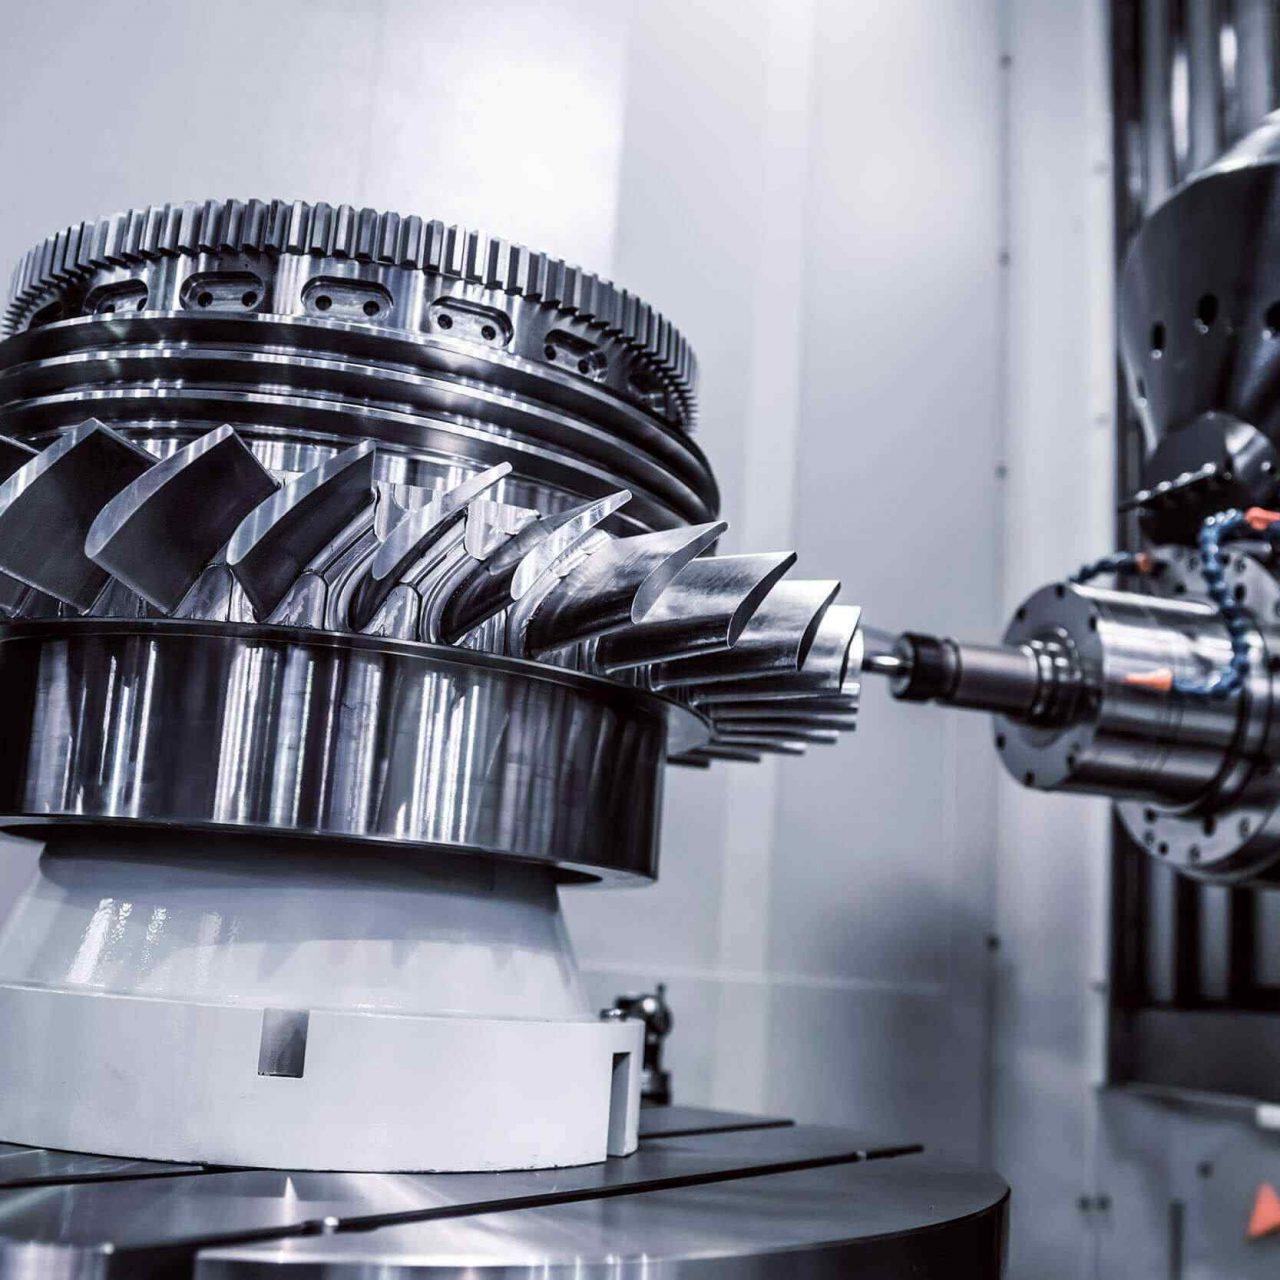 Amwerk builds for aero industry